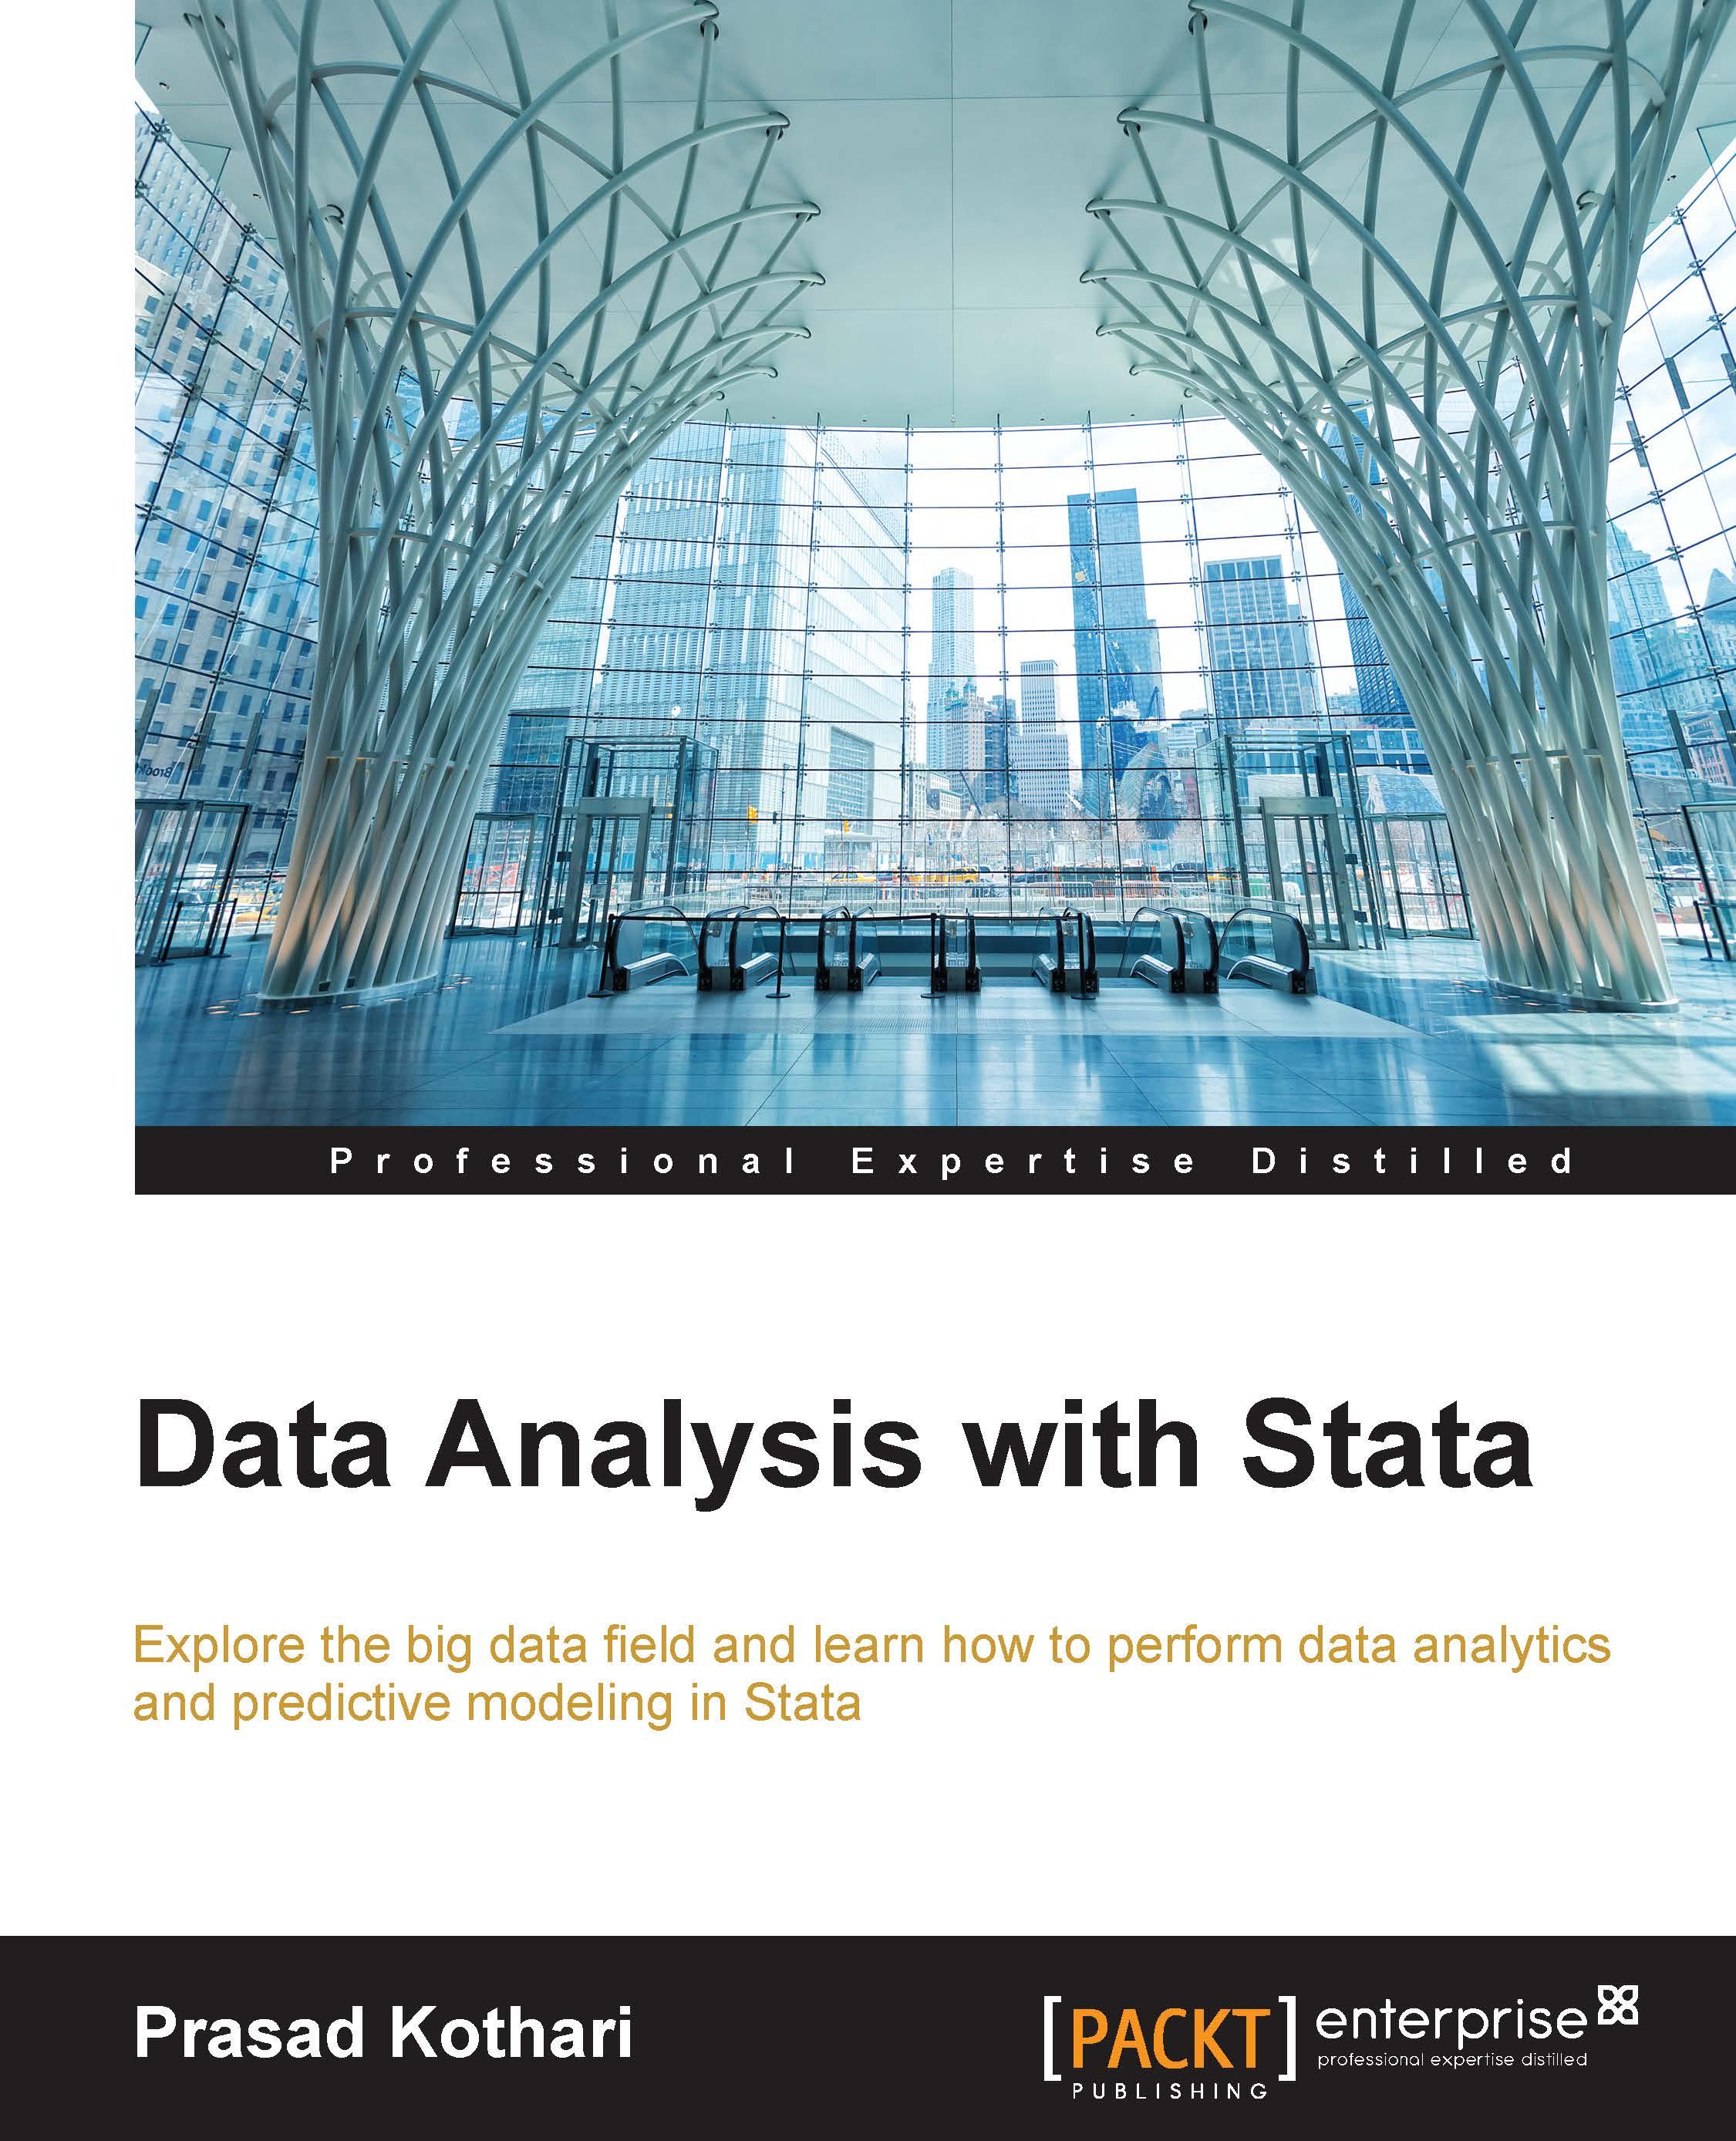 Data Analysis with Stata by Prasad Kothari   Read online